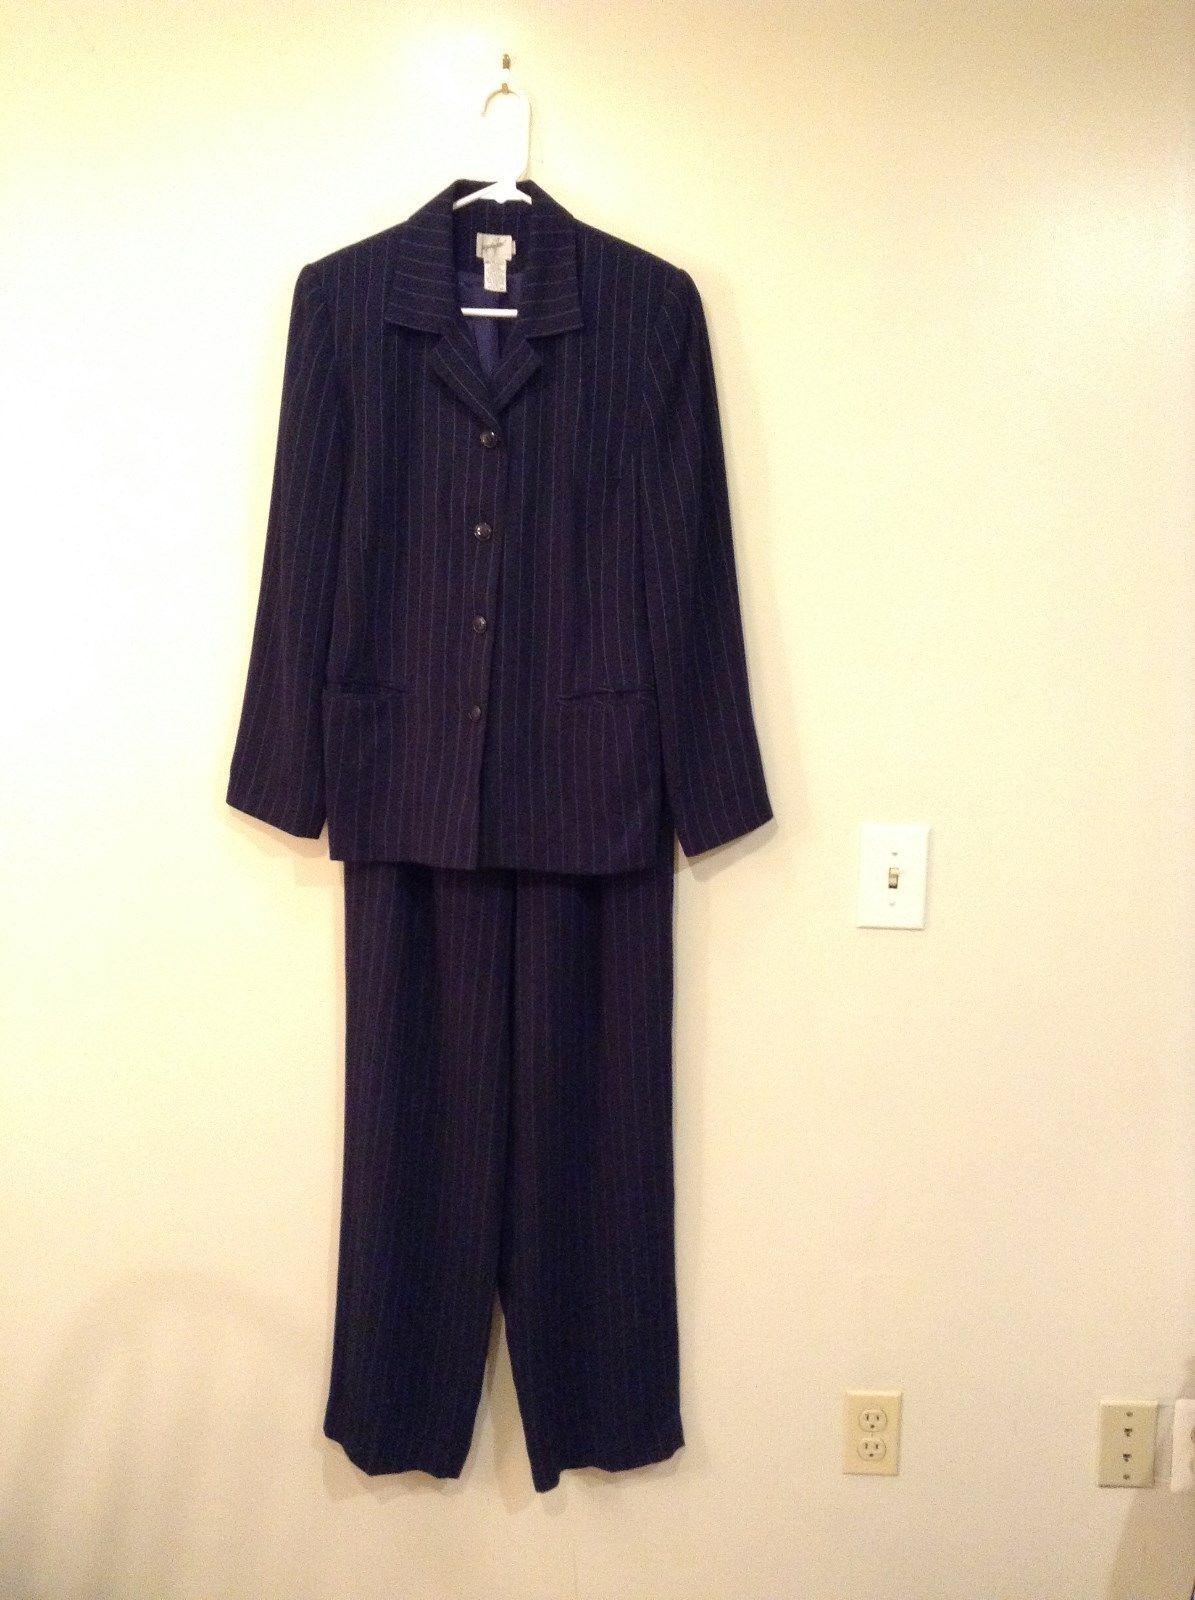 Navy Blue with White Stripes Jacket and Pant Set Jacqueline Ferrar Size 8